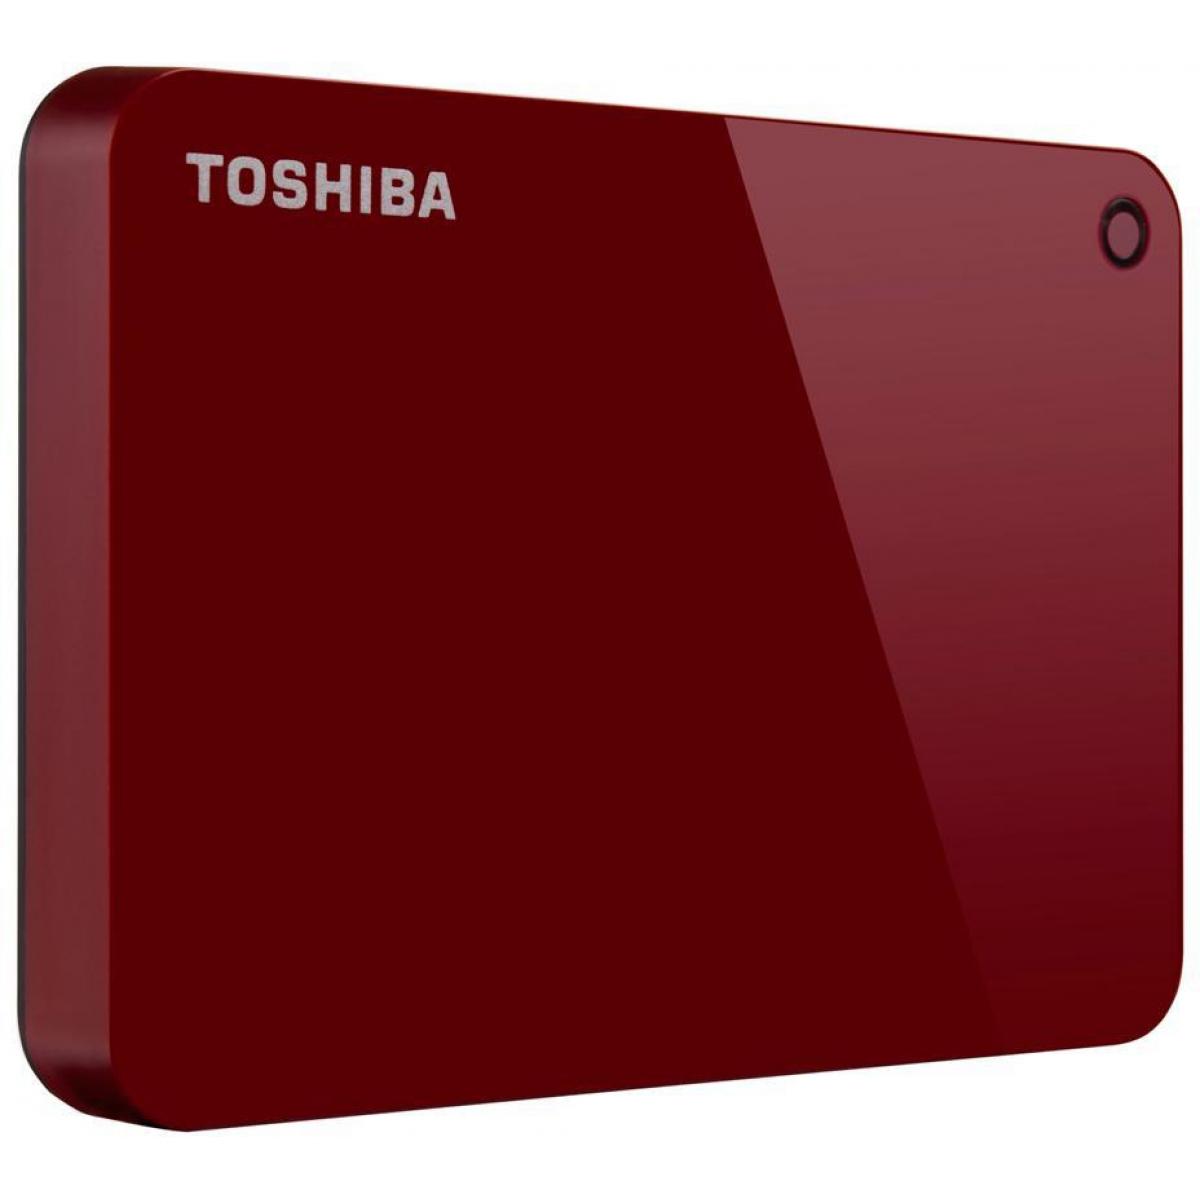 HD Externo Portátil Toshiba Canvio Advance 3TB HDTC930XR3CA USB 3.0 Vermelho